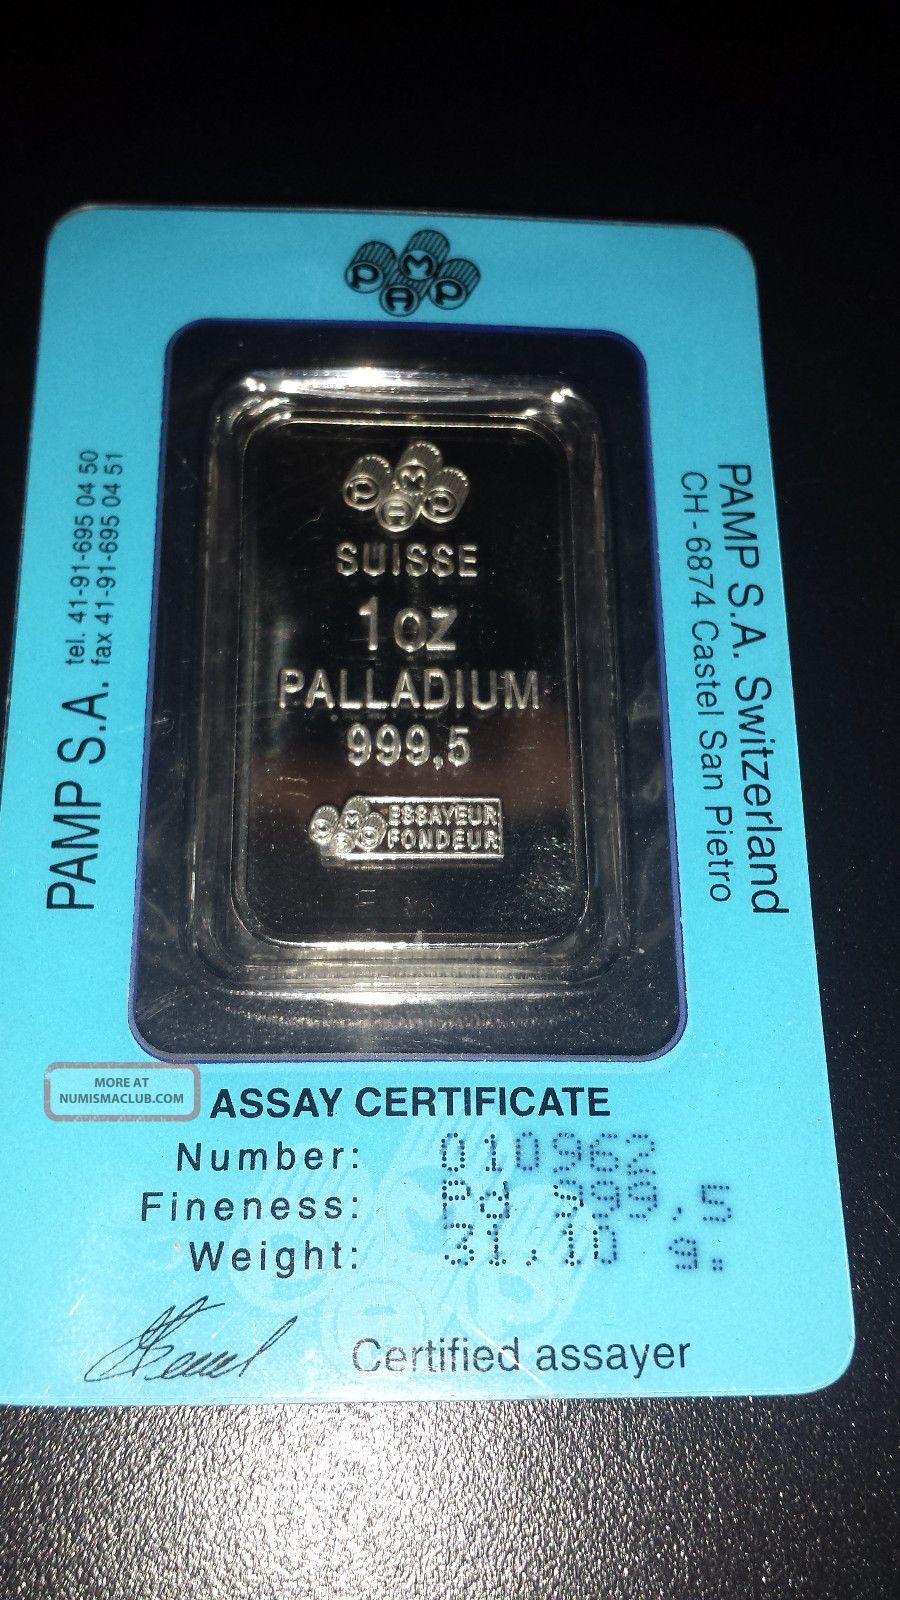 1 Ounce Oz Pamp Suisse Palladium Bar (w/ Assay).  9995,  Fine Pure Bullion photo